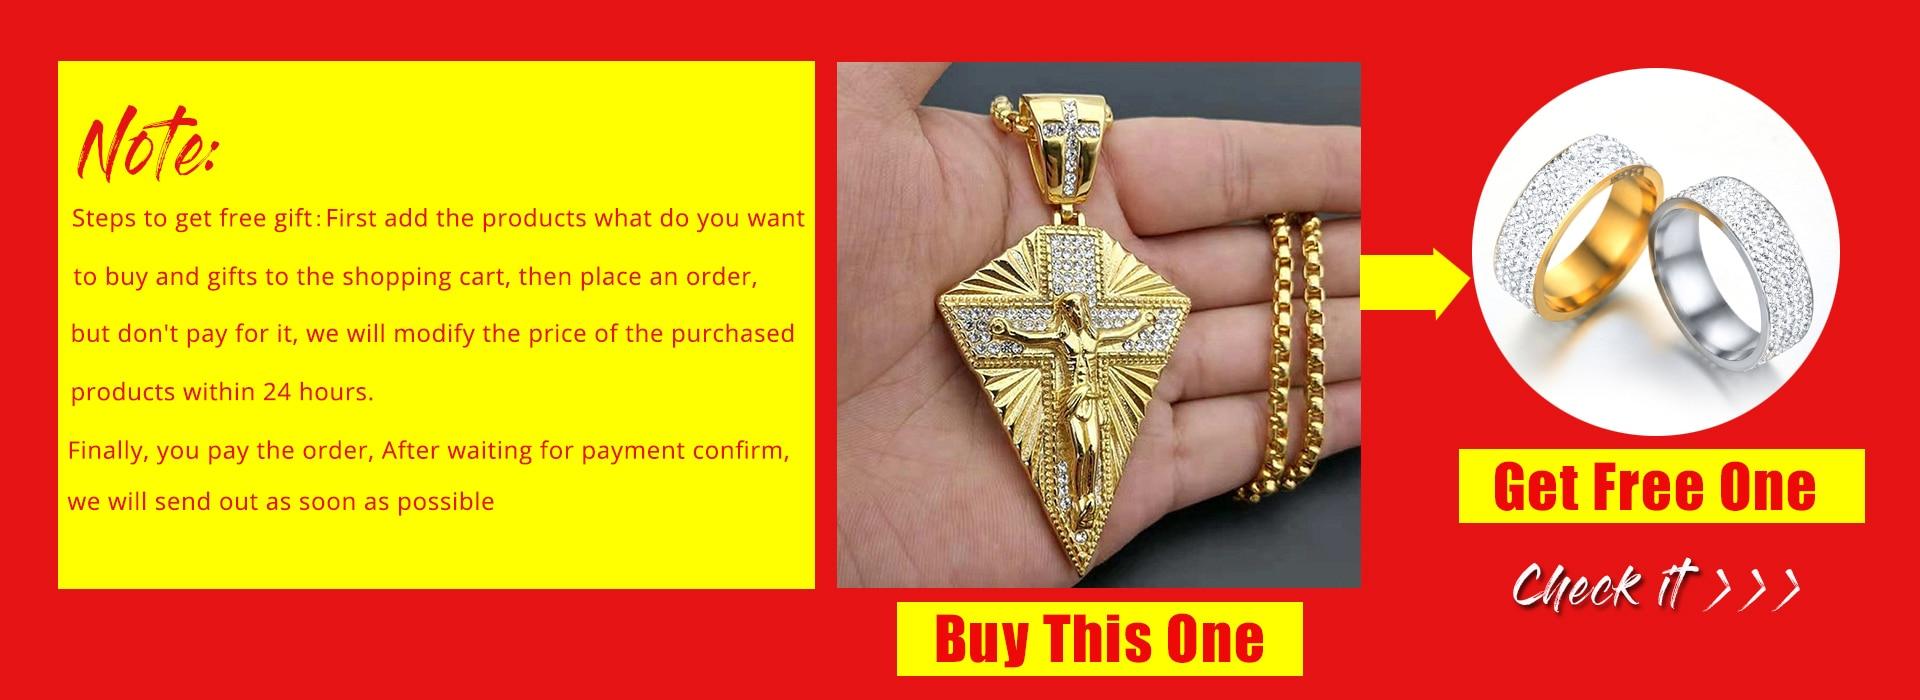 corrente cor do ouro dos homens crucifixo